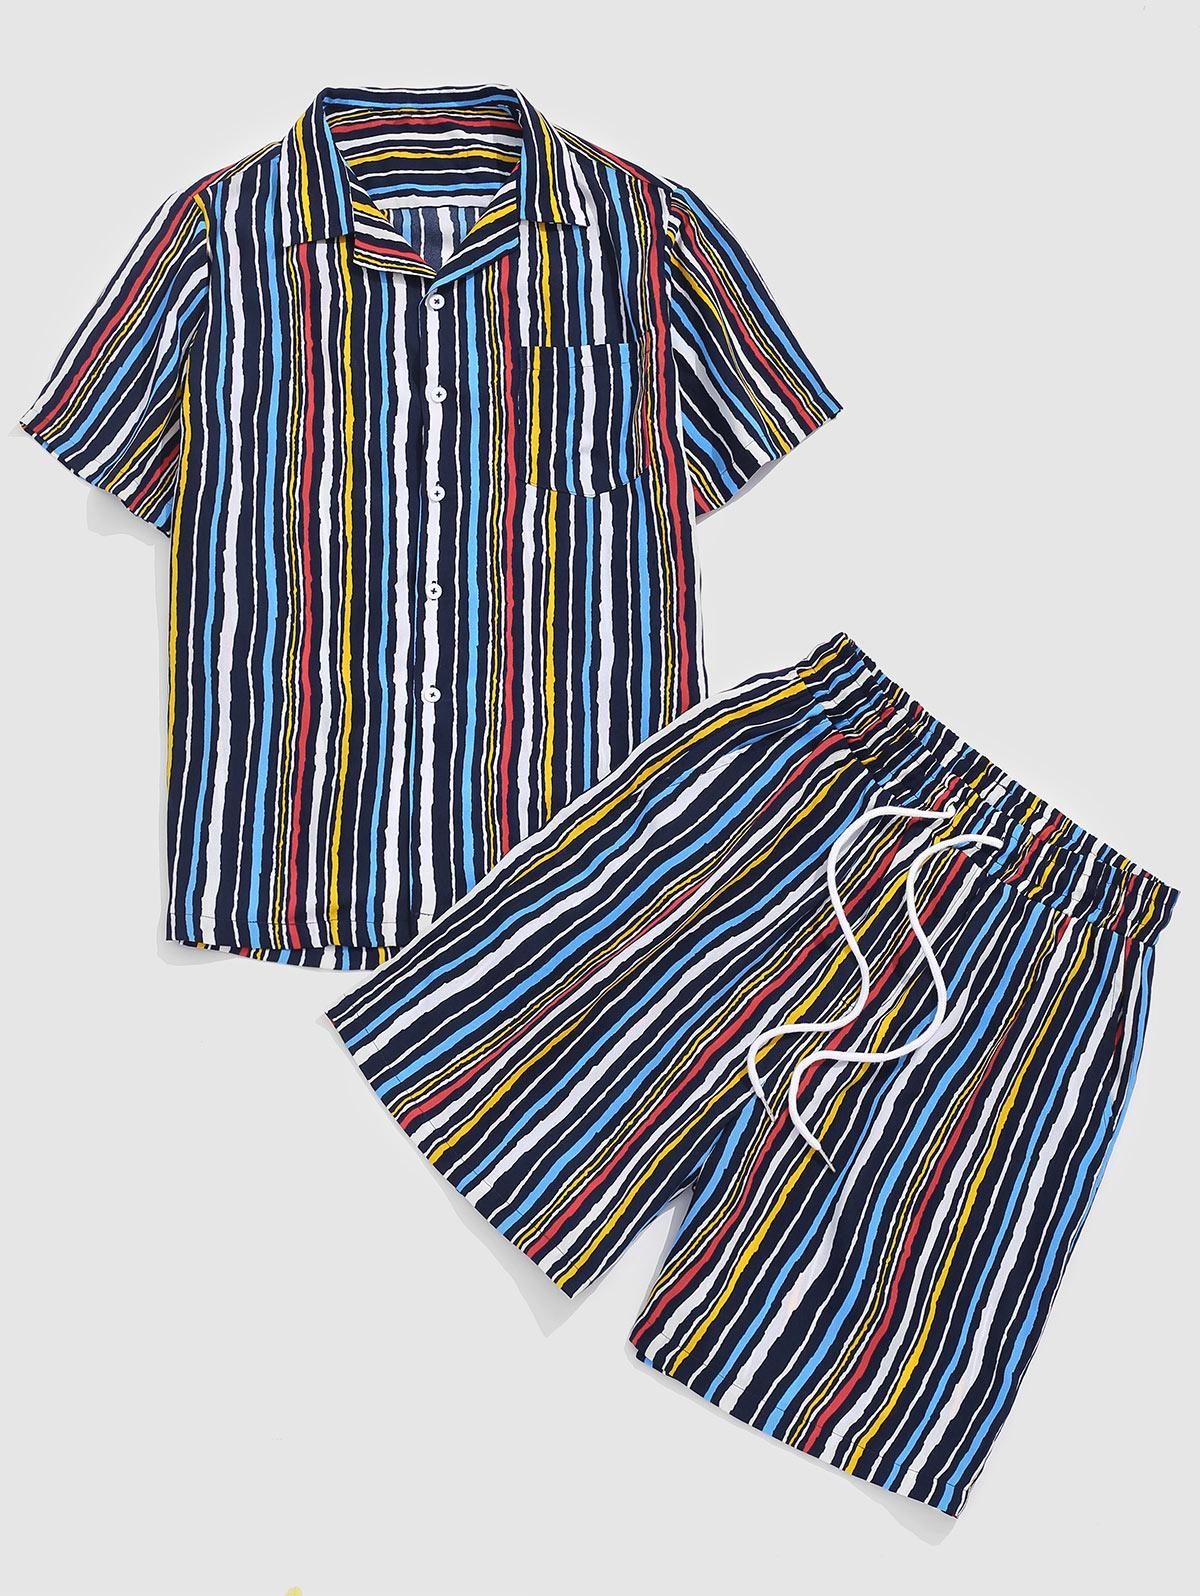 ZAFUL Colorful Striped Print Pocket Shirt and Shorts Set